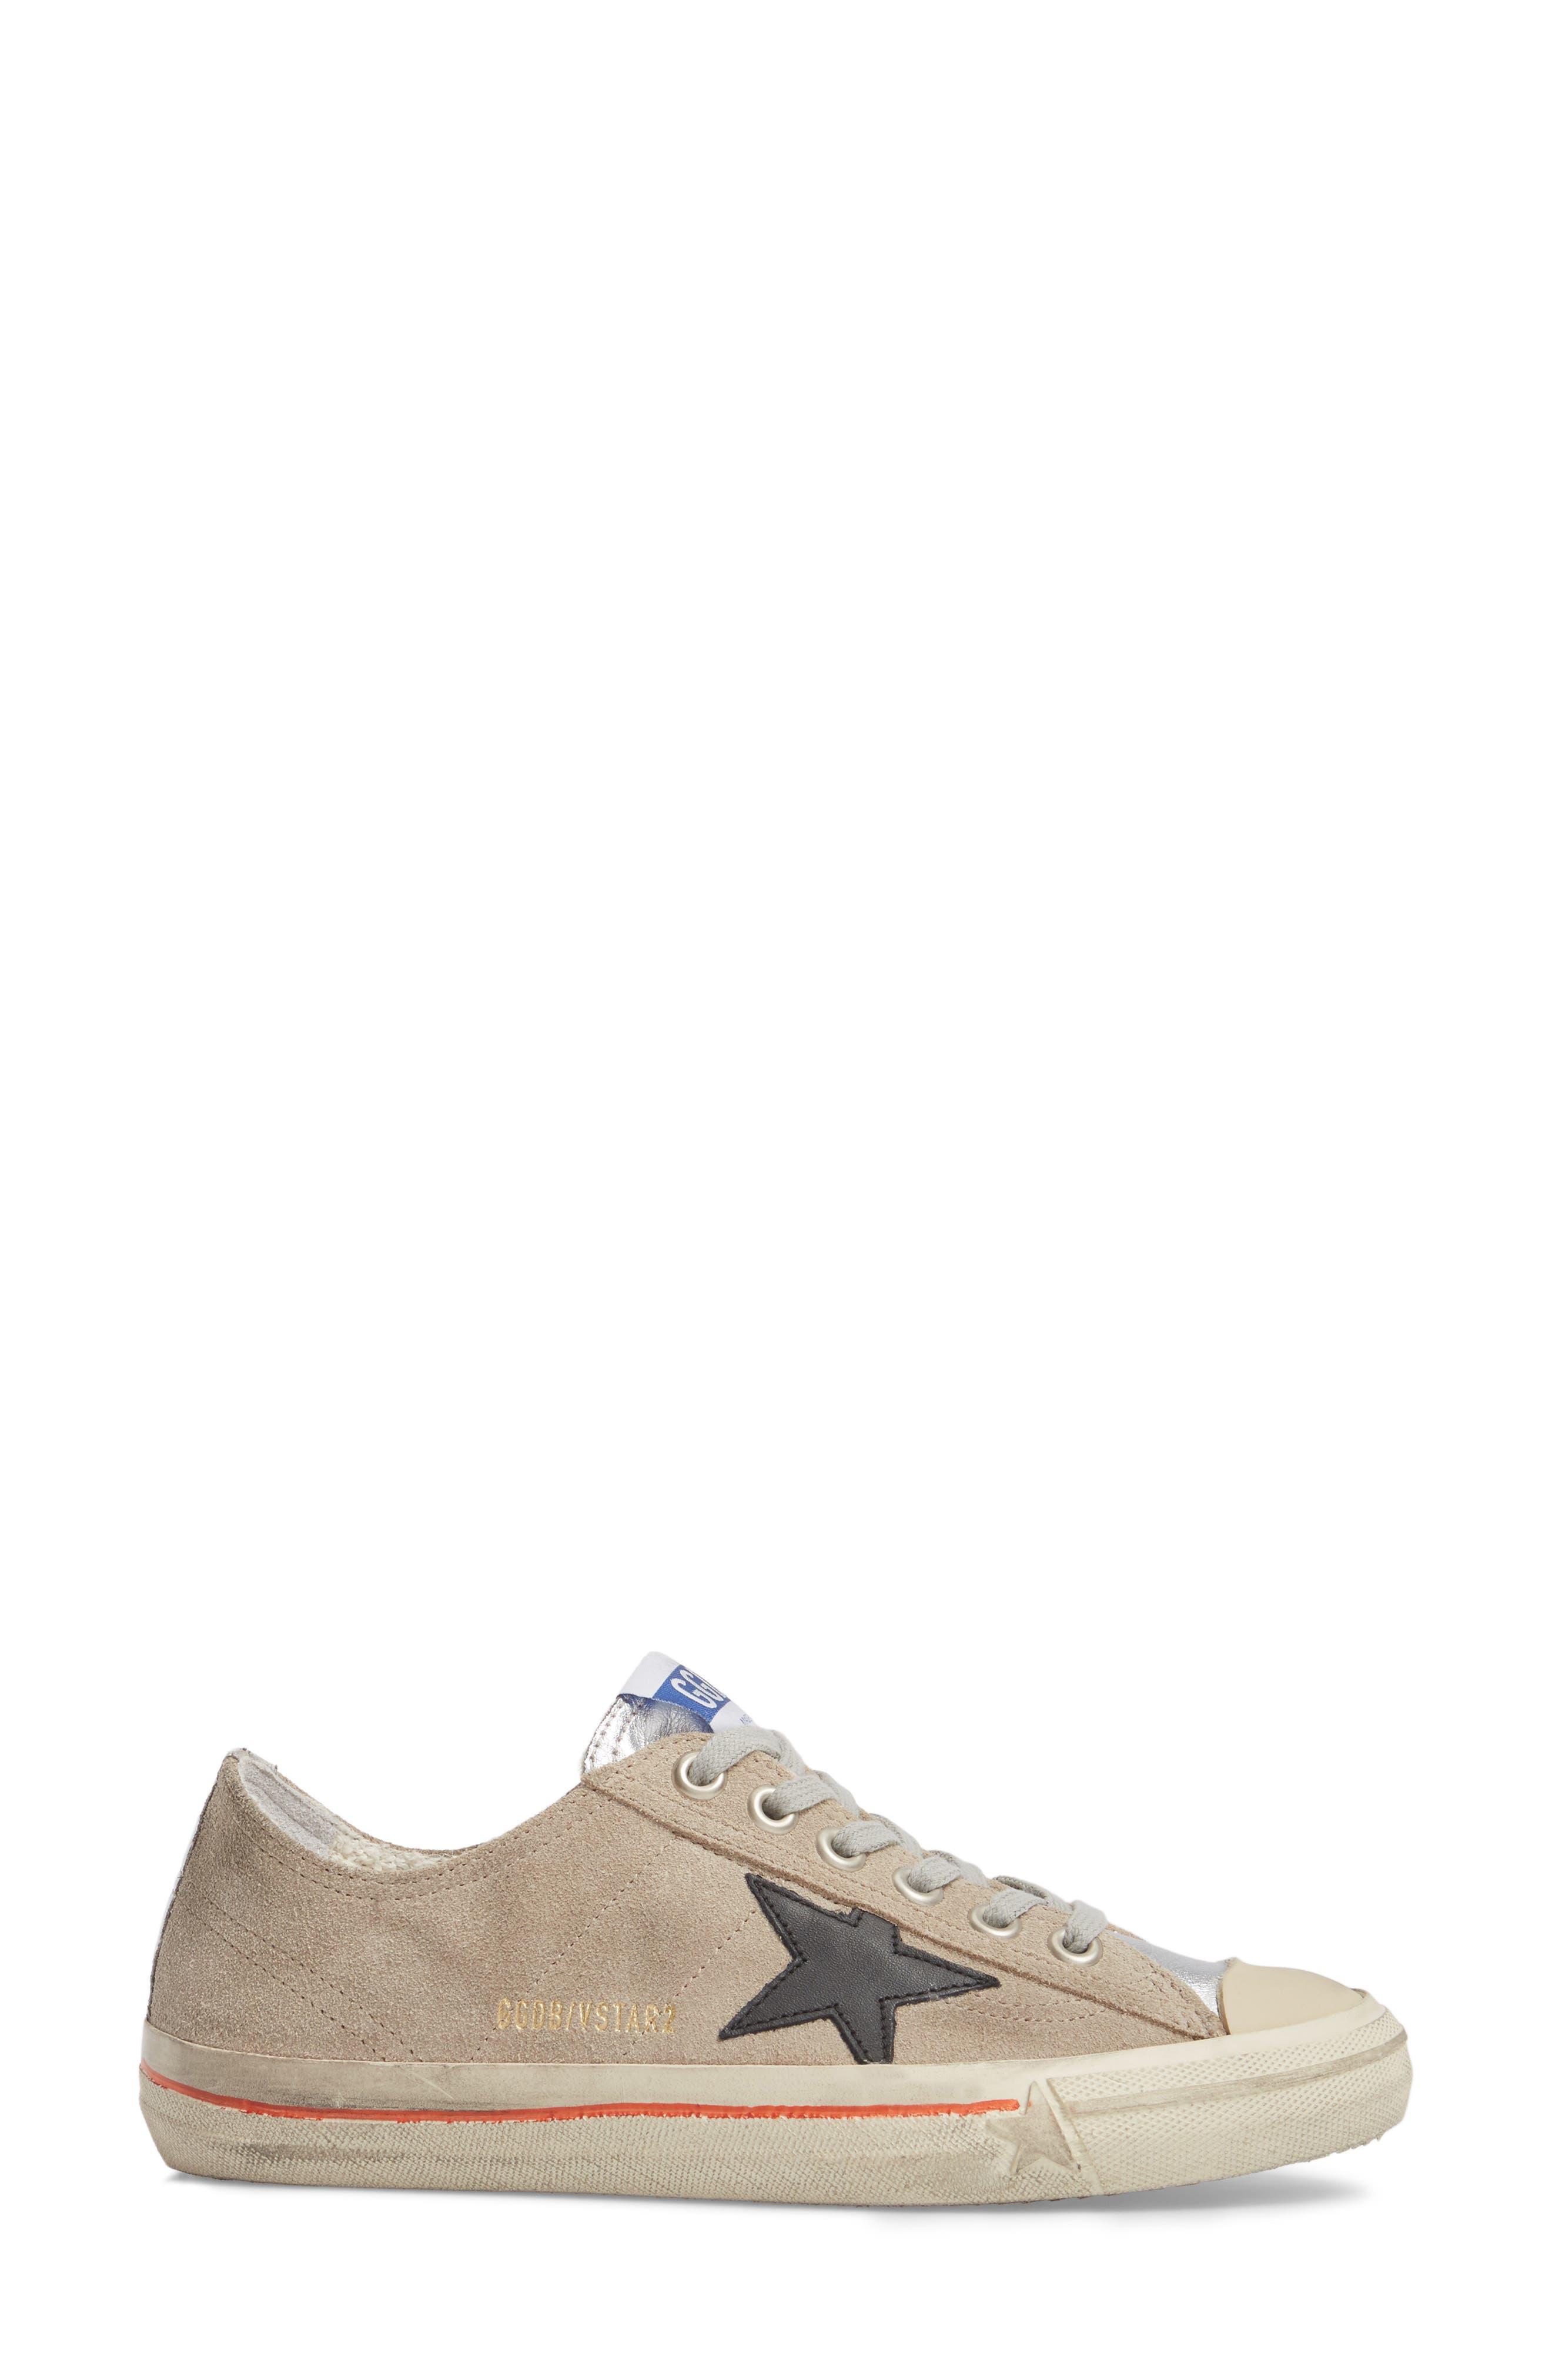 V-Star 2 Low Top Sneaker,                             Alternate thumbnail 3, color,                             020